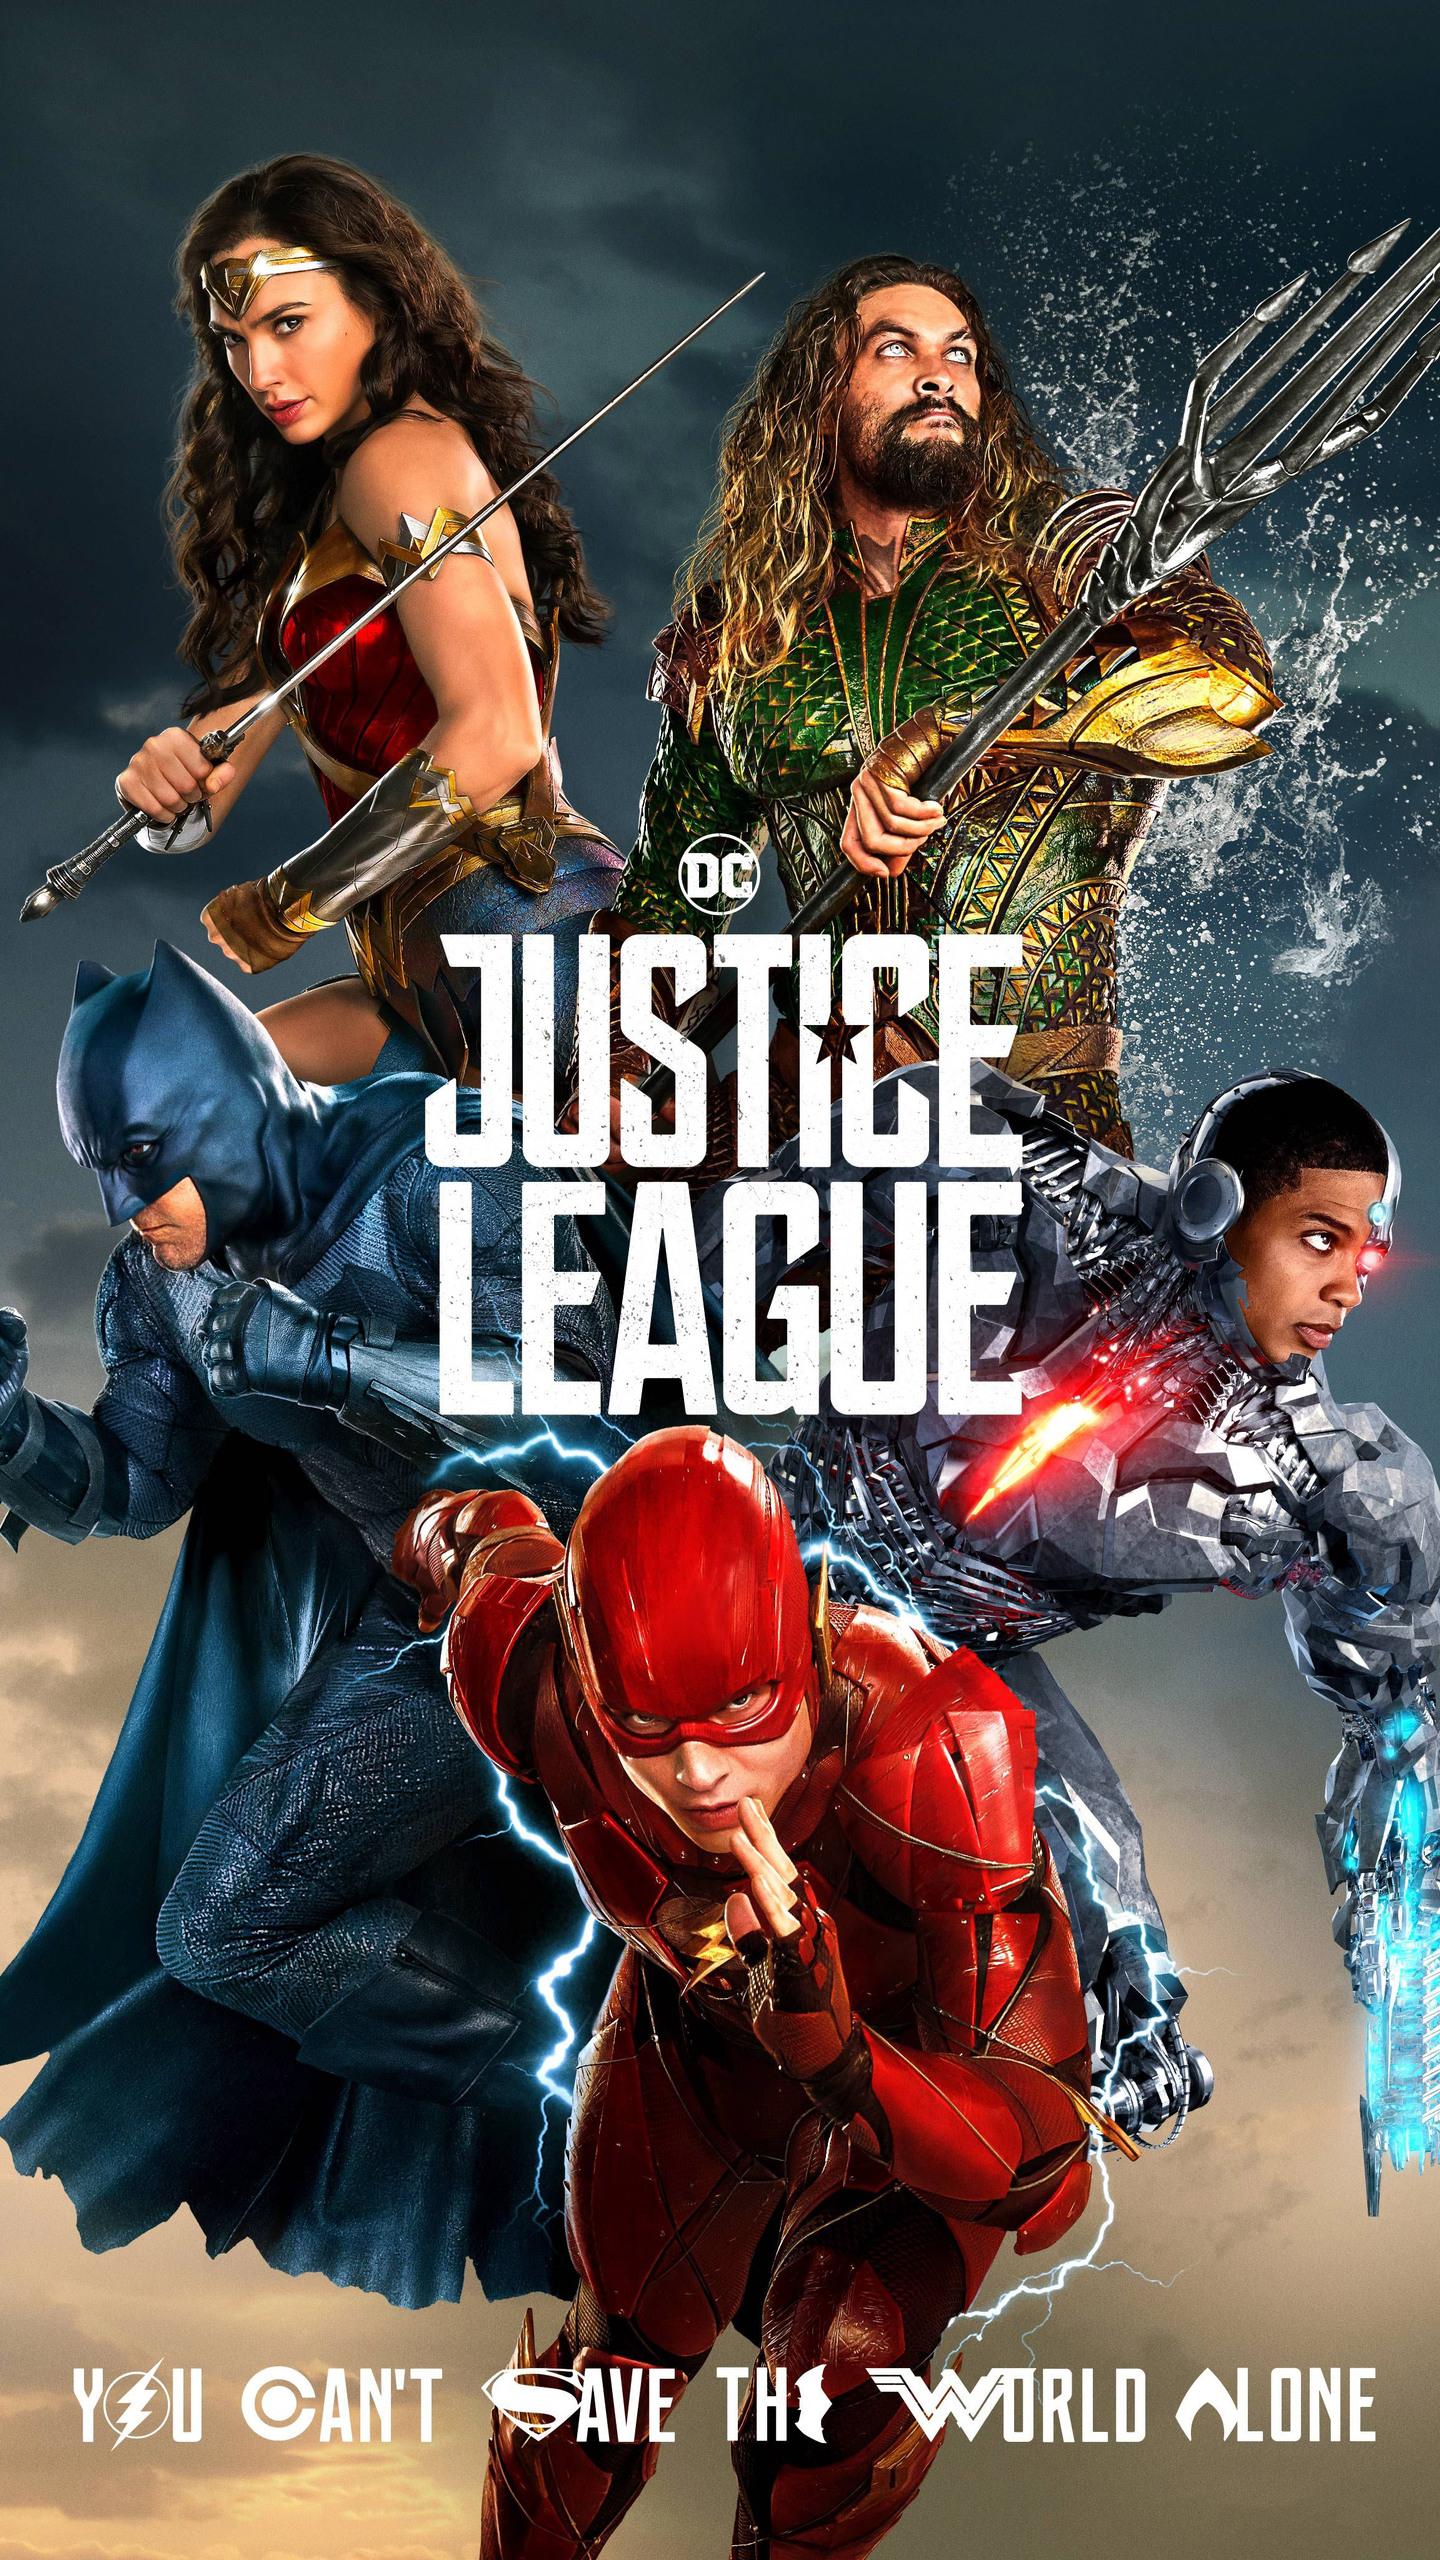 wonder-woman-aquaman-justice-league-2017-vw.jpg